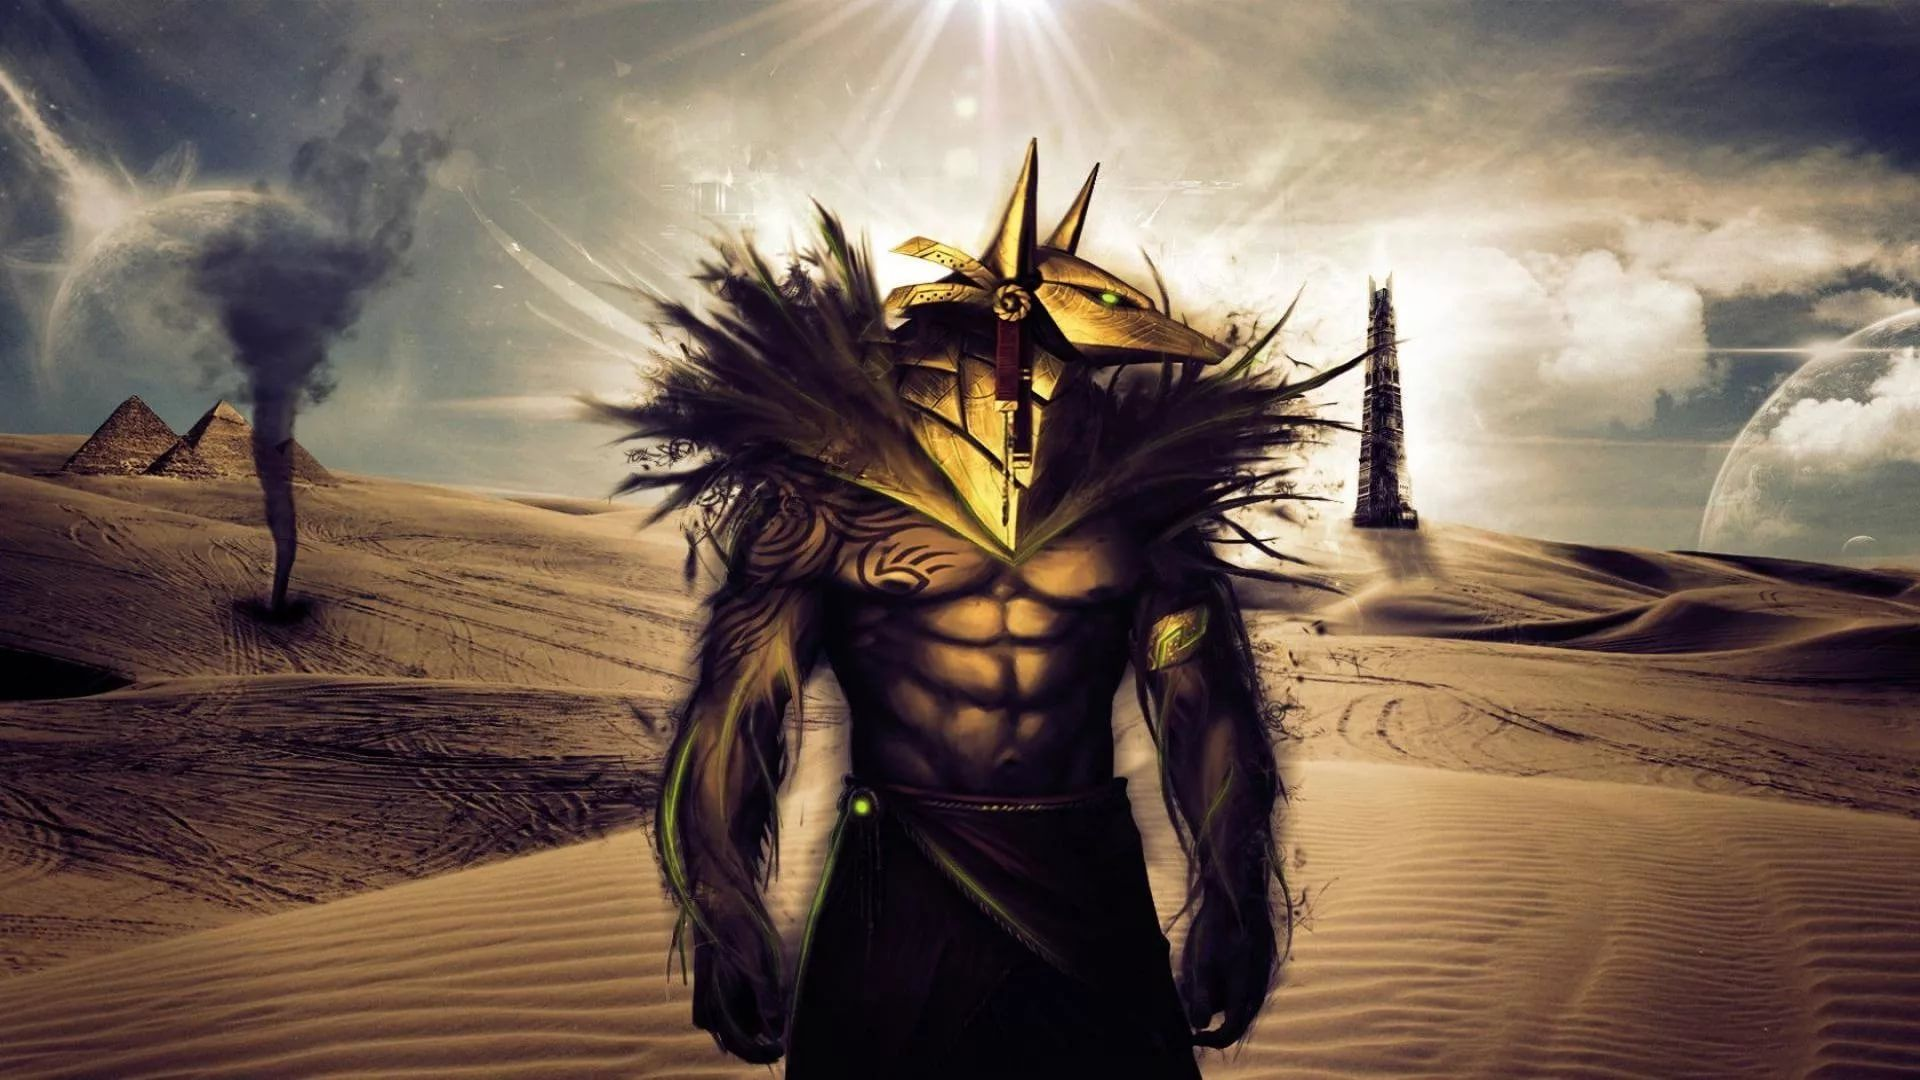 Cool Egyptian desktop wallpaper